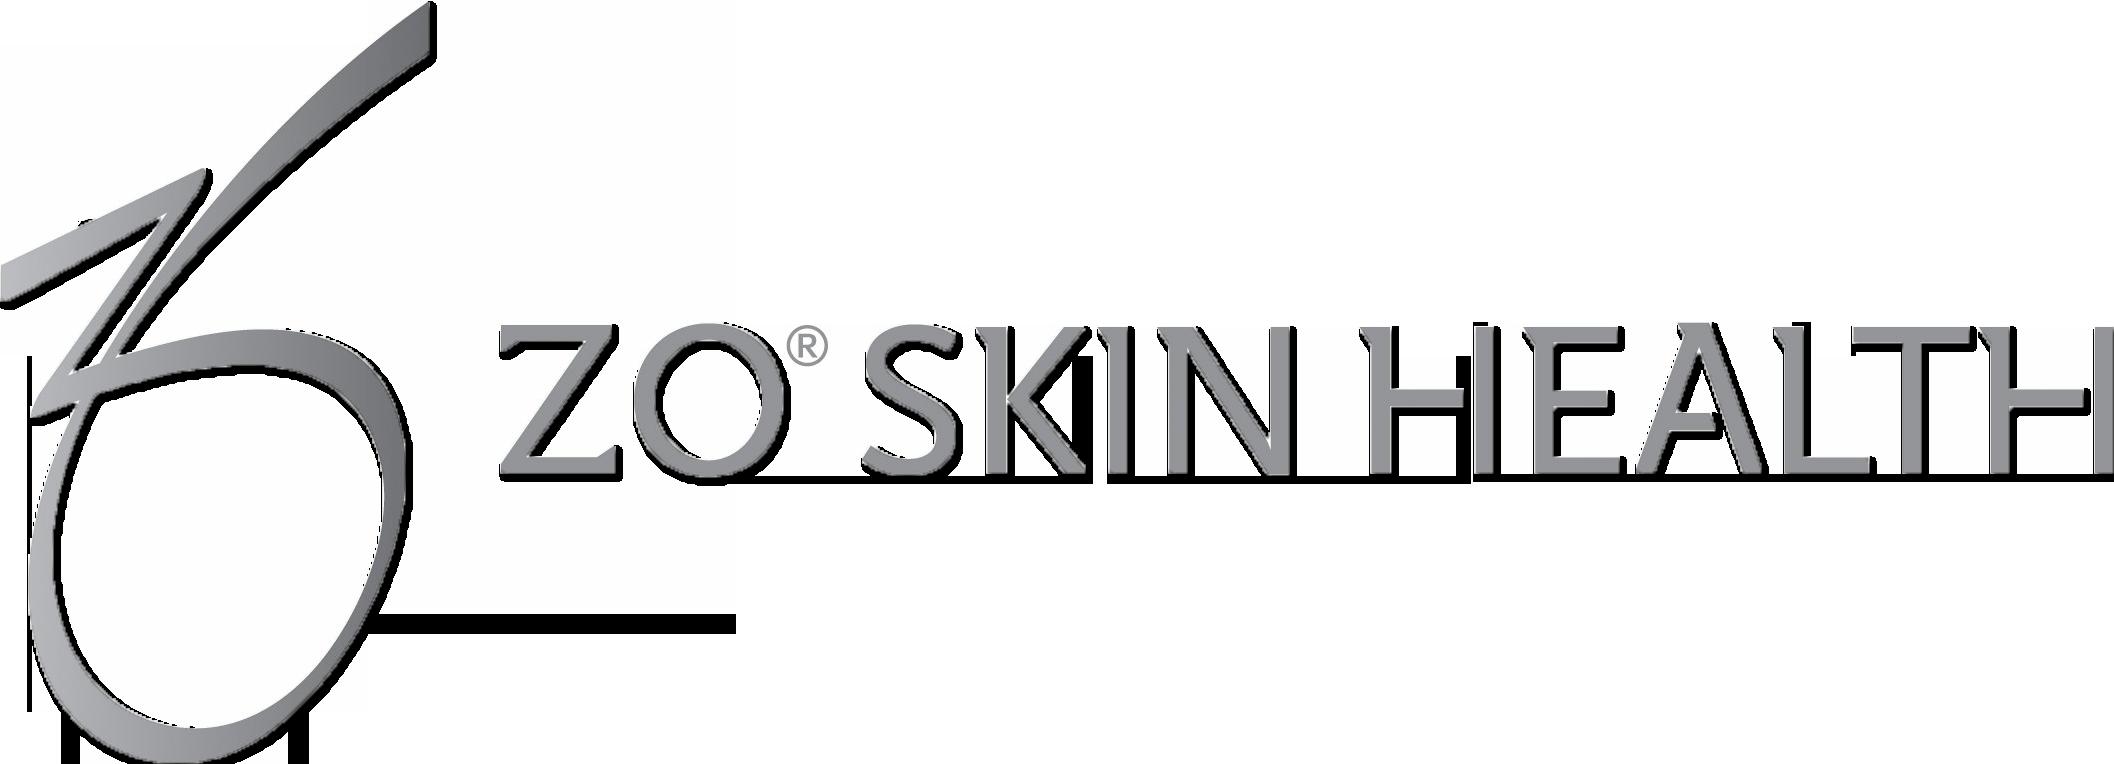 Zo nuangle medical. Skin clipart skin health